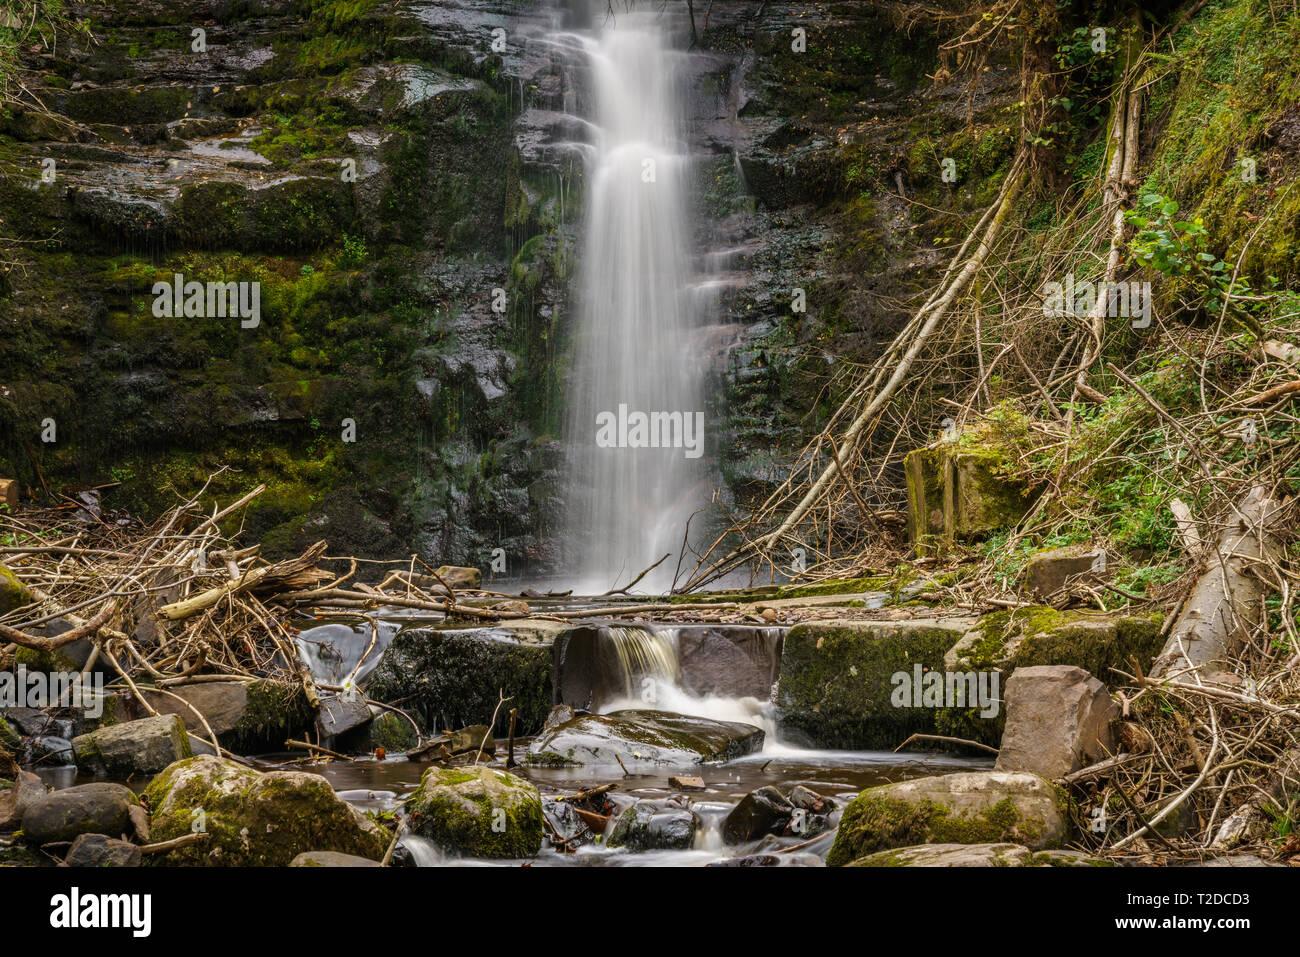 A waterfall in Blaen-y-glyn near Torpantau, Powys, Wales, UK - Stock Image